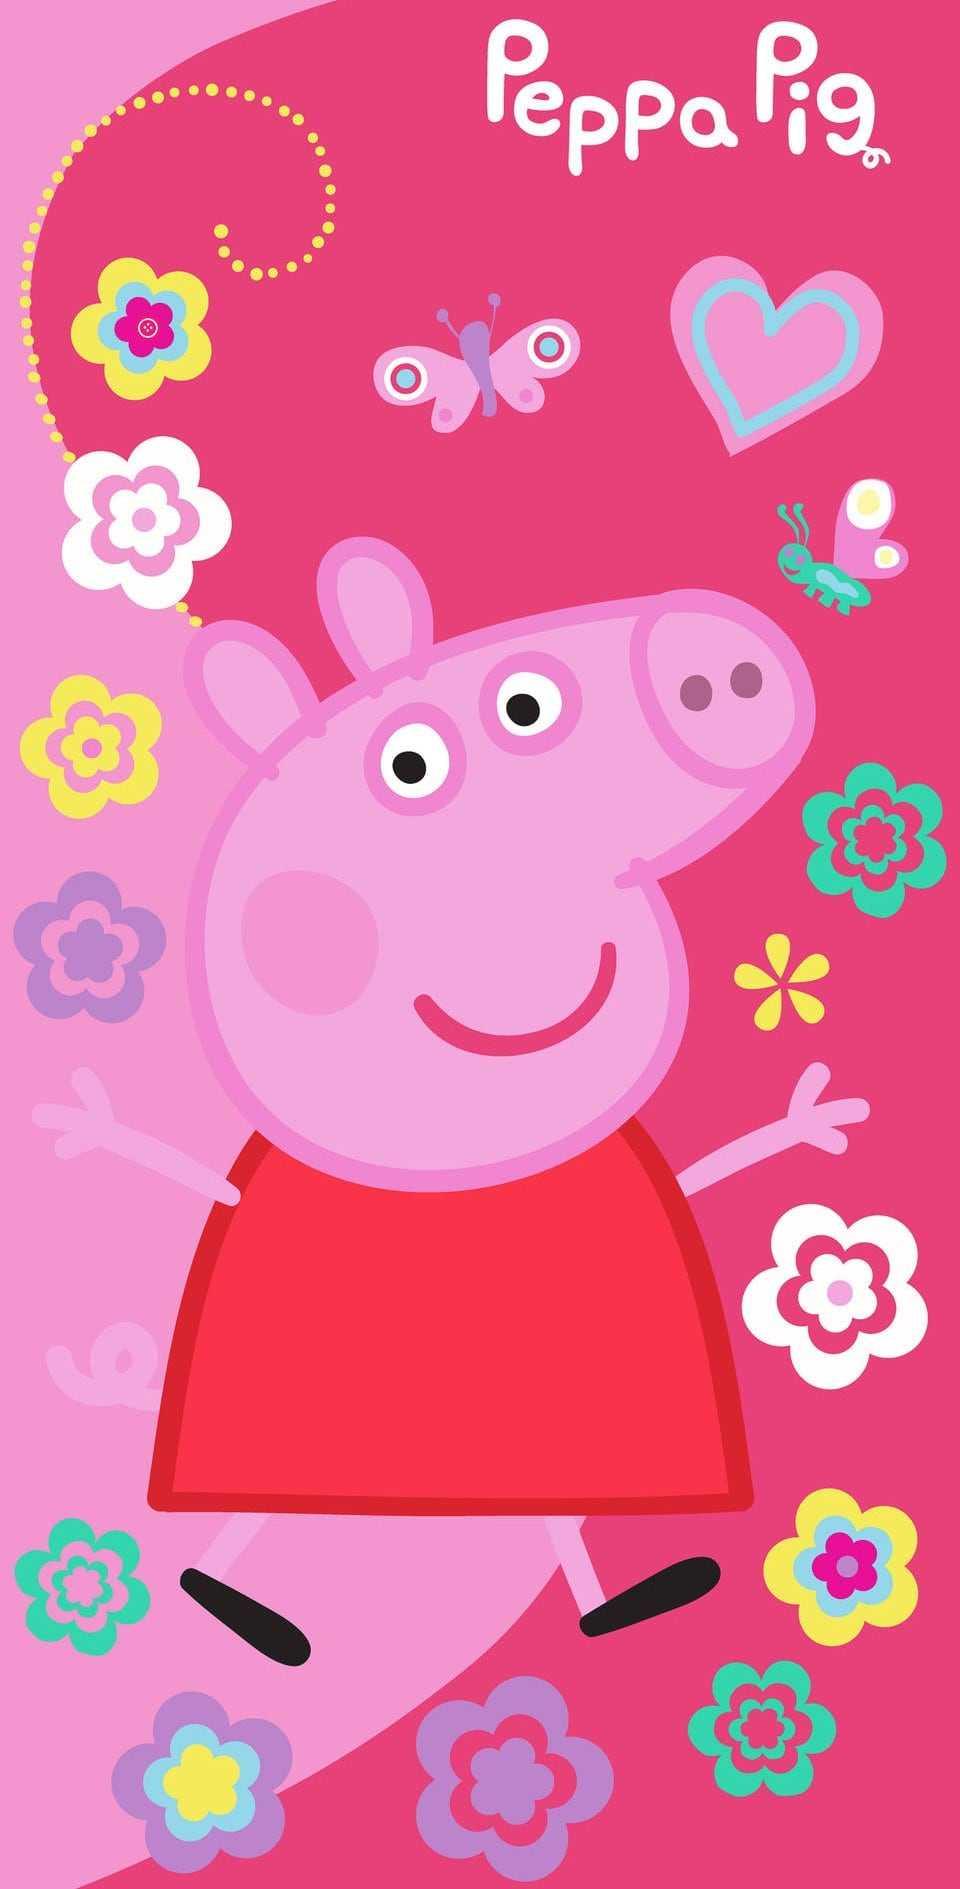 Peppa Pig House Wallpaper Ixpap